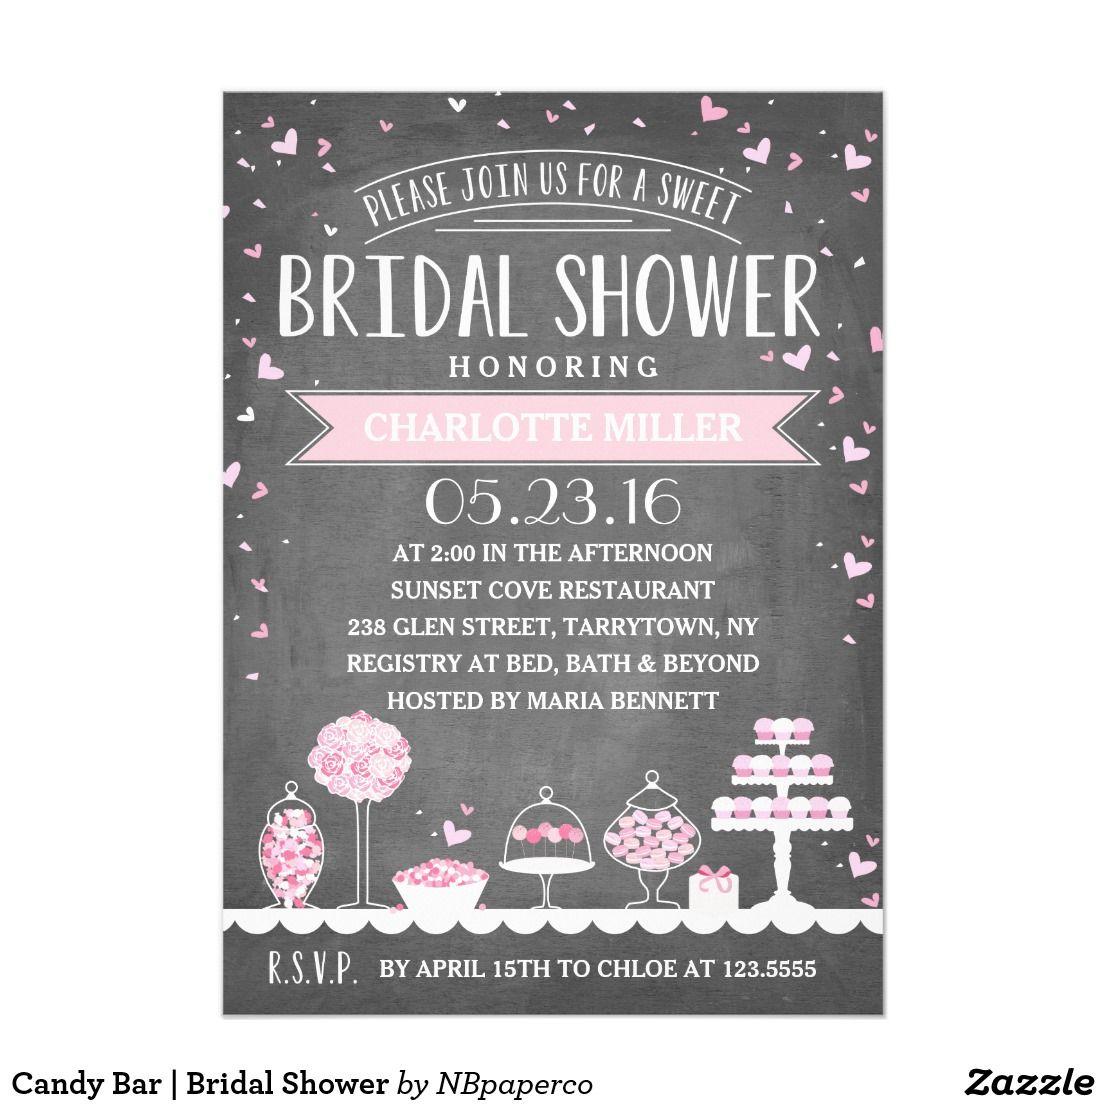 Candy Bar   Bridal Shower   Bachelorette Party Wedding Invitations ...